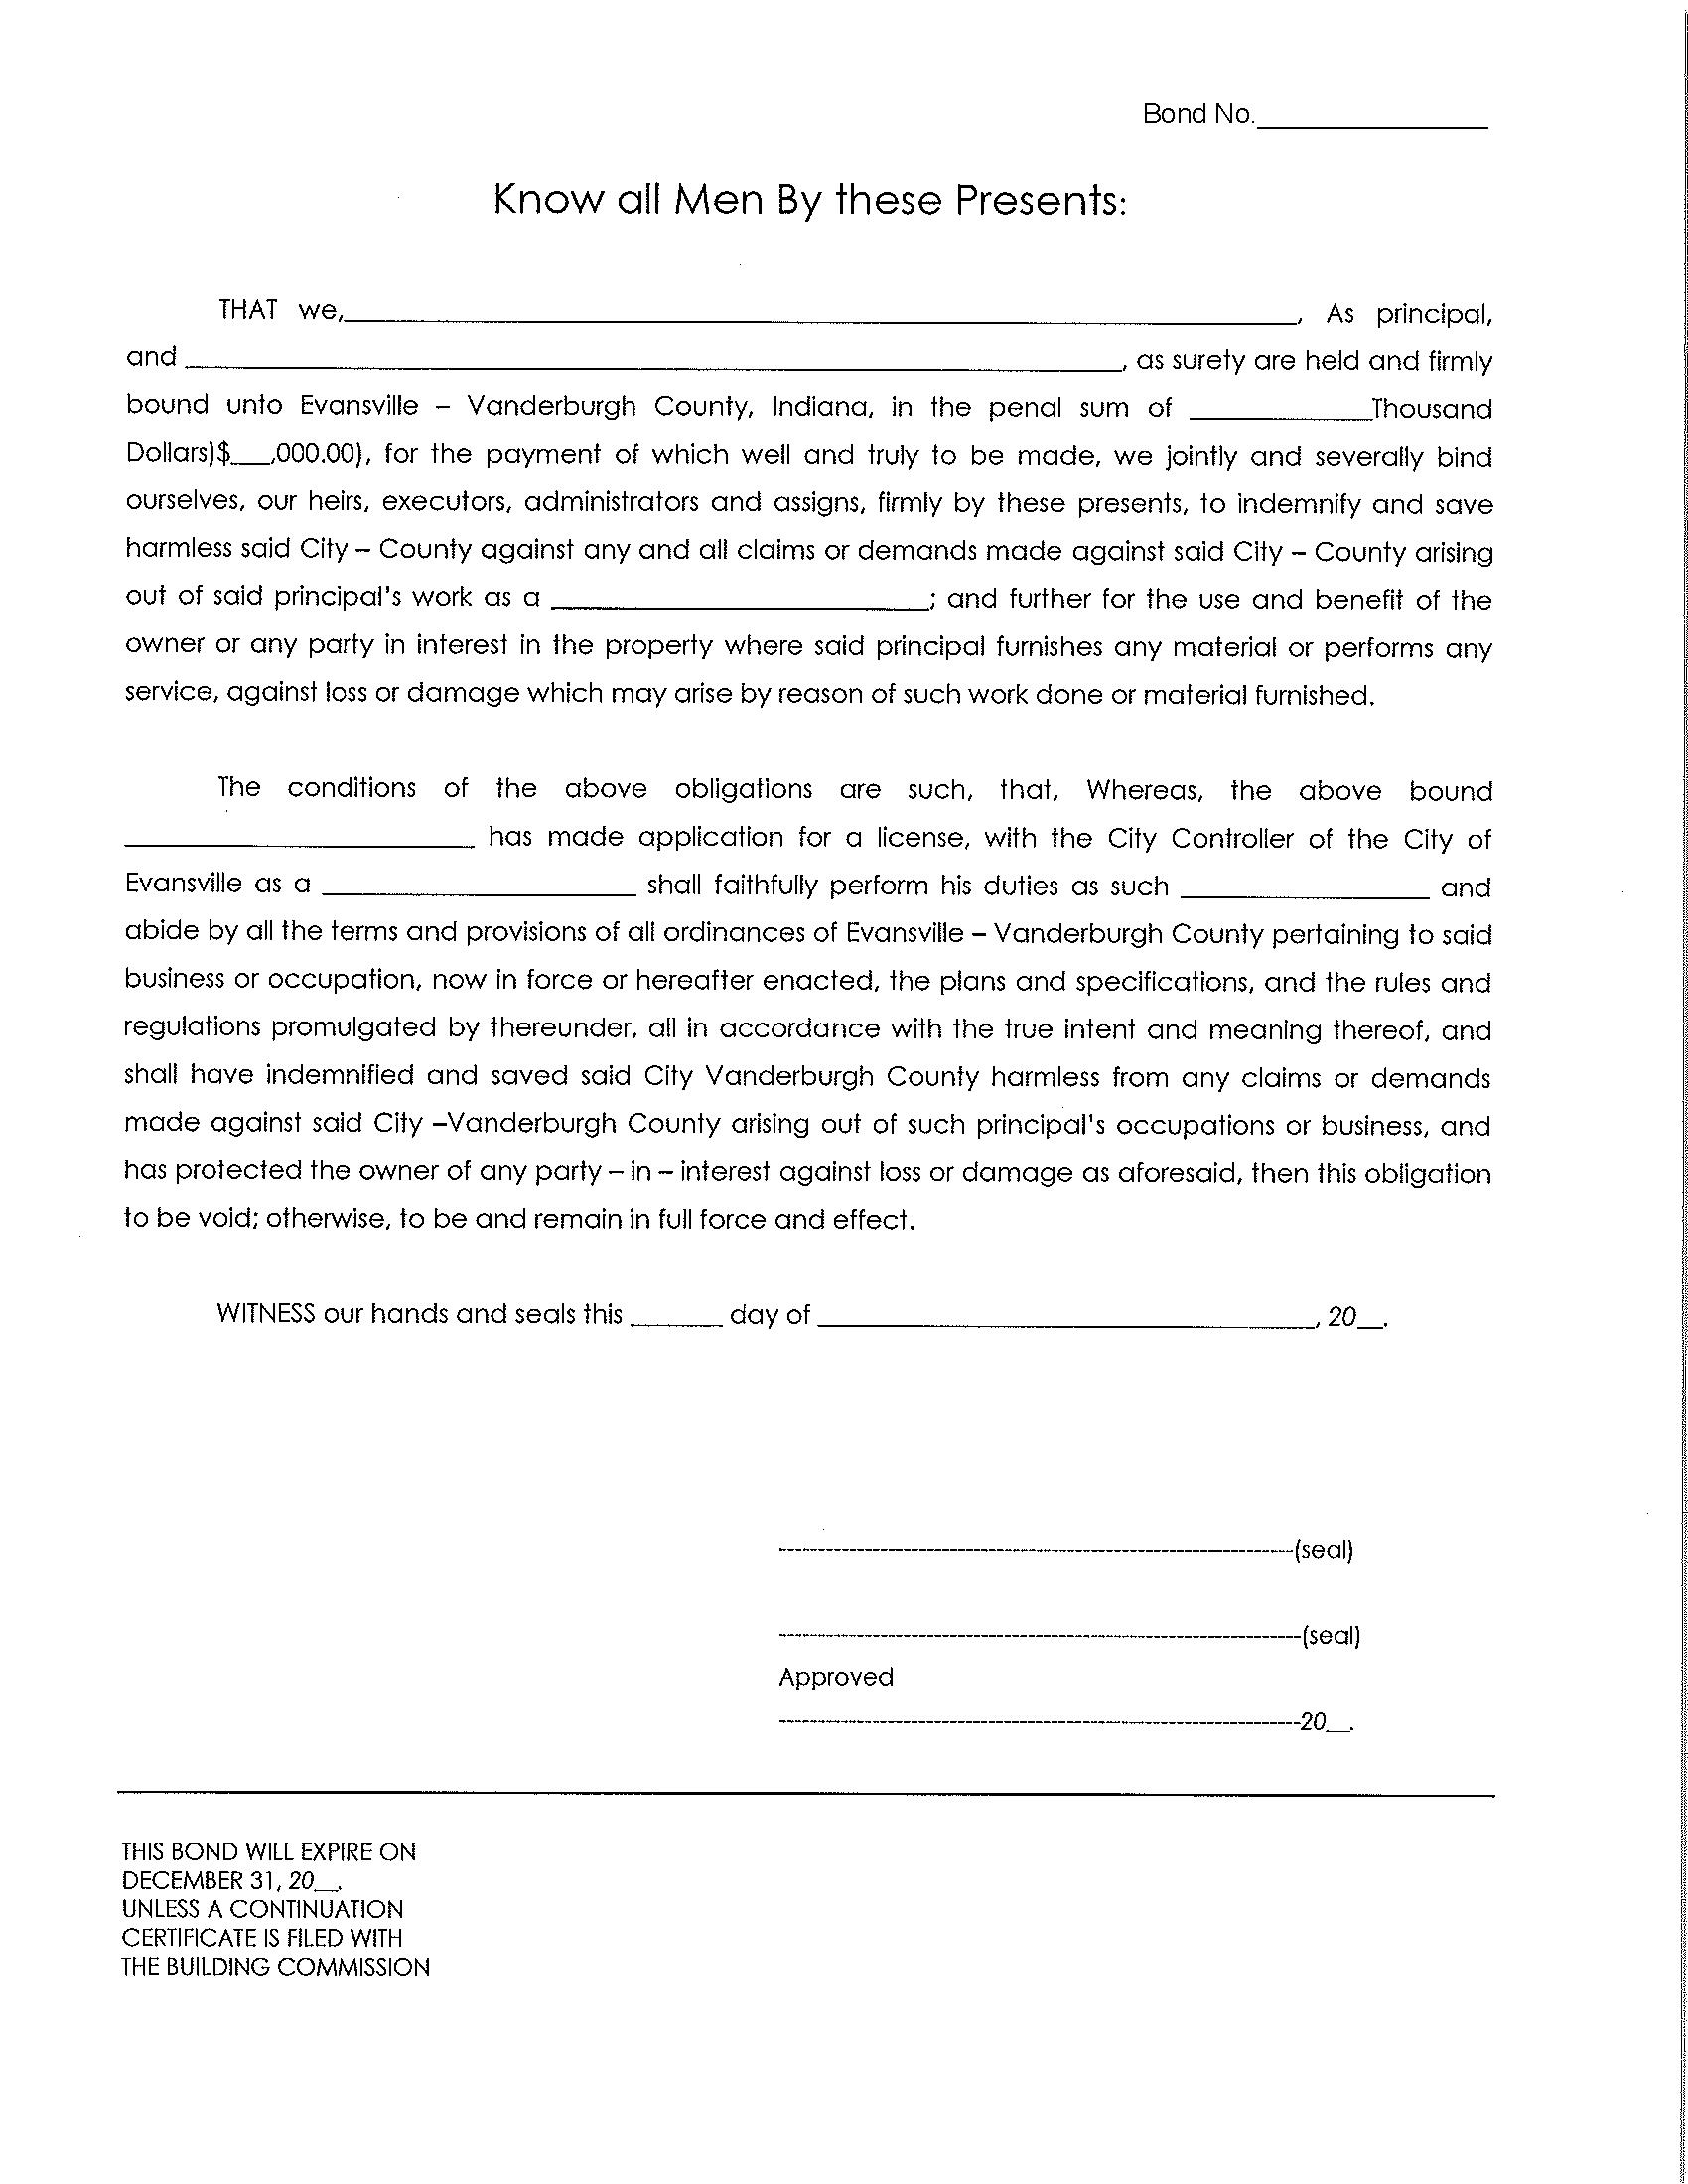 Evansville / Vanderburgh - City / County License/Permit sample image